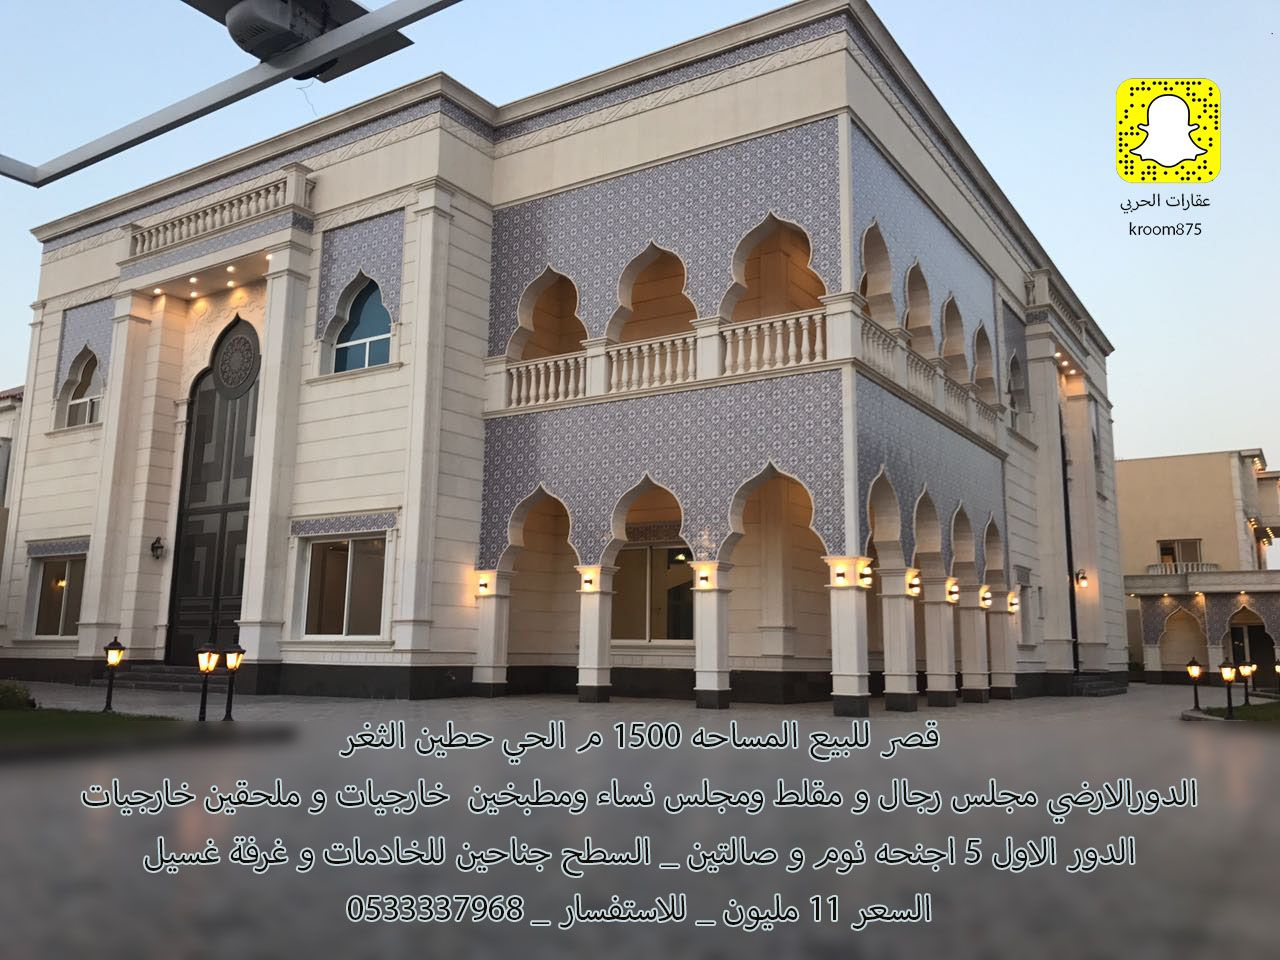 قصر فخم للبيع المساحه 1500متر الحي حطين الثغر Http Aqarboursa Com Showthread Php 105457 D9 82 D8 B5 D8 B1 D9 81 D8 Ae D9 85 House Styles Mansions Taj Mahal